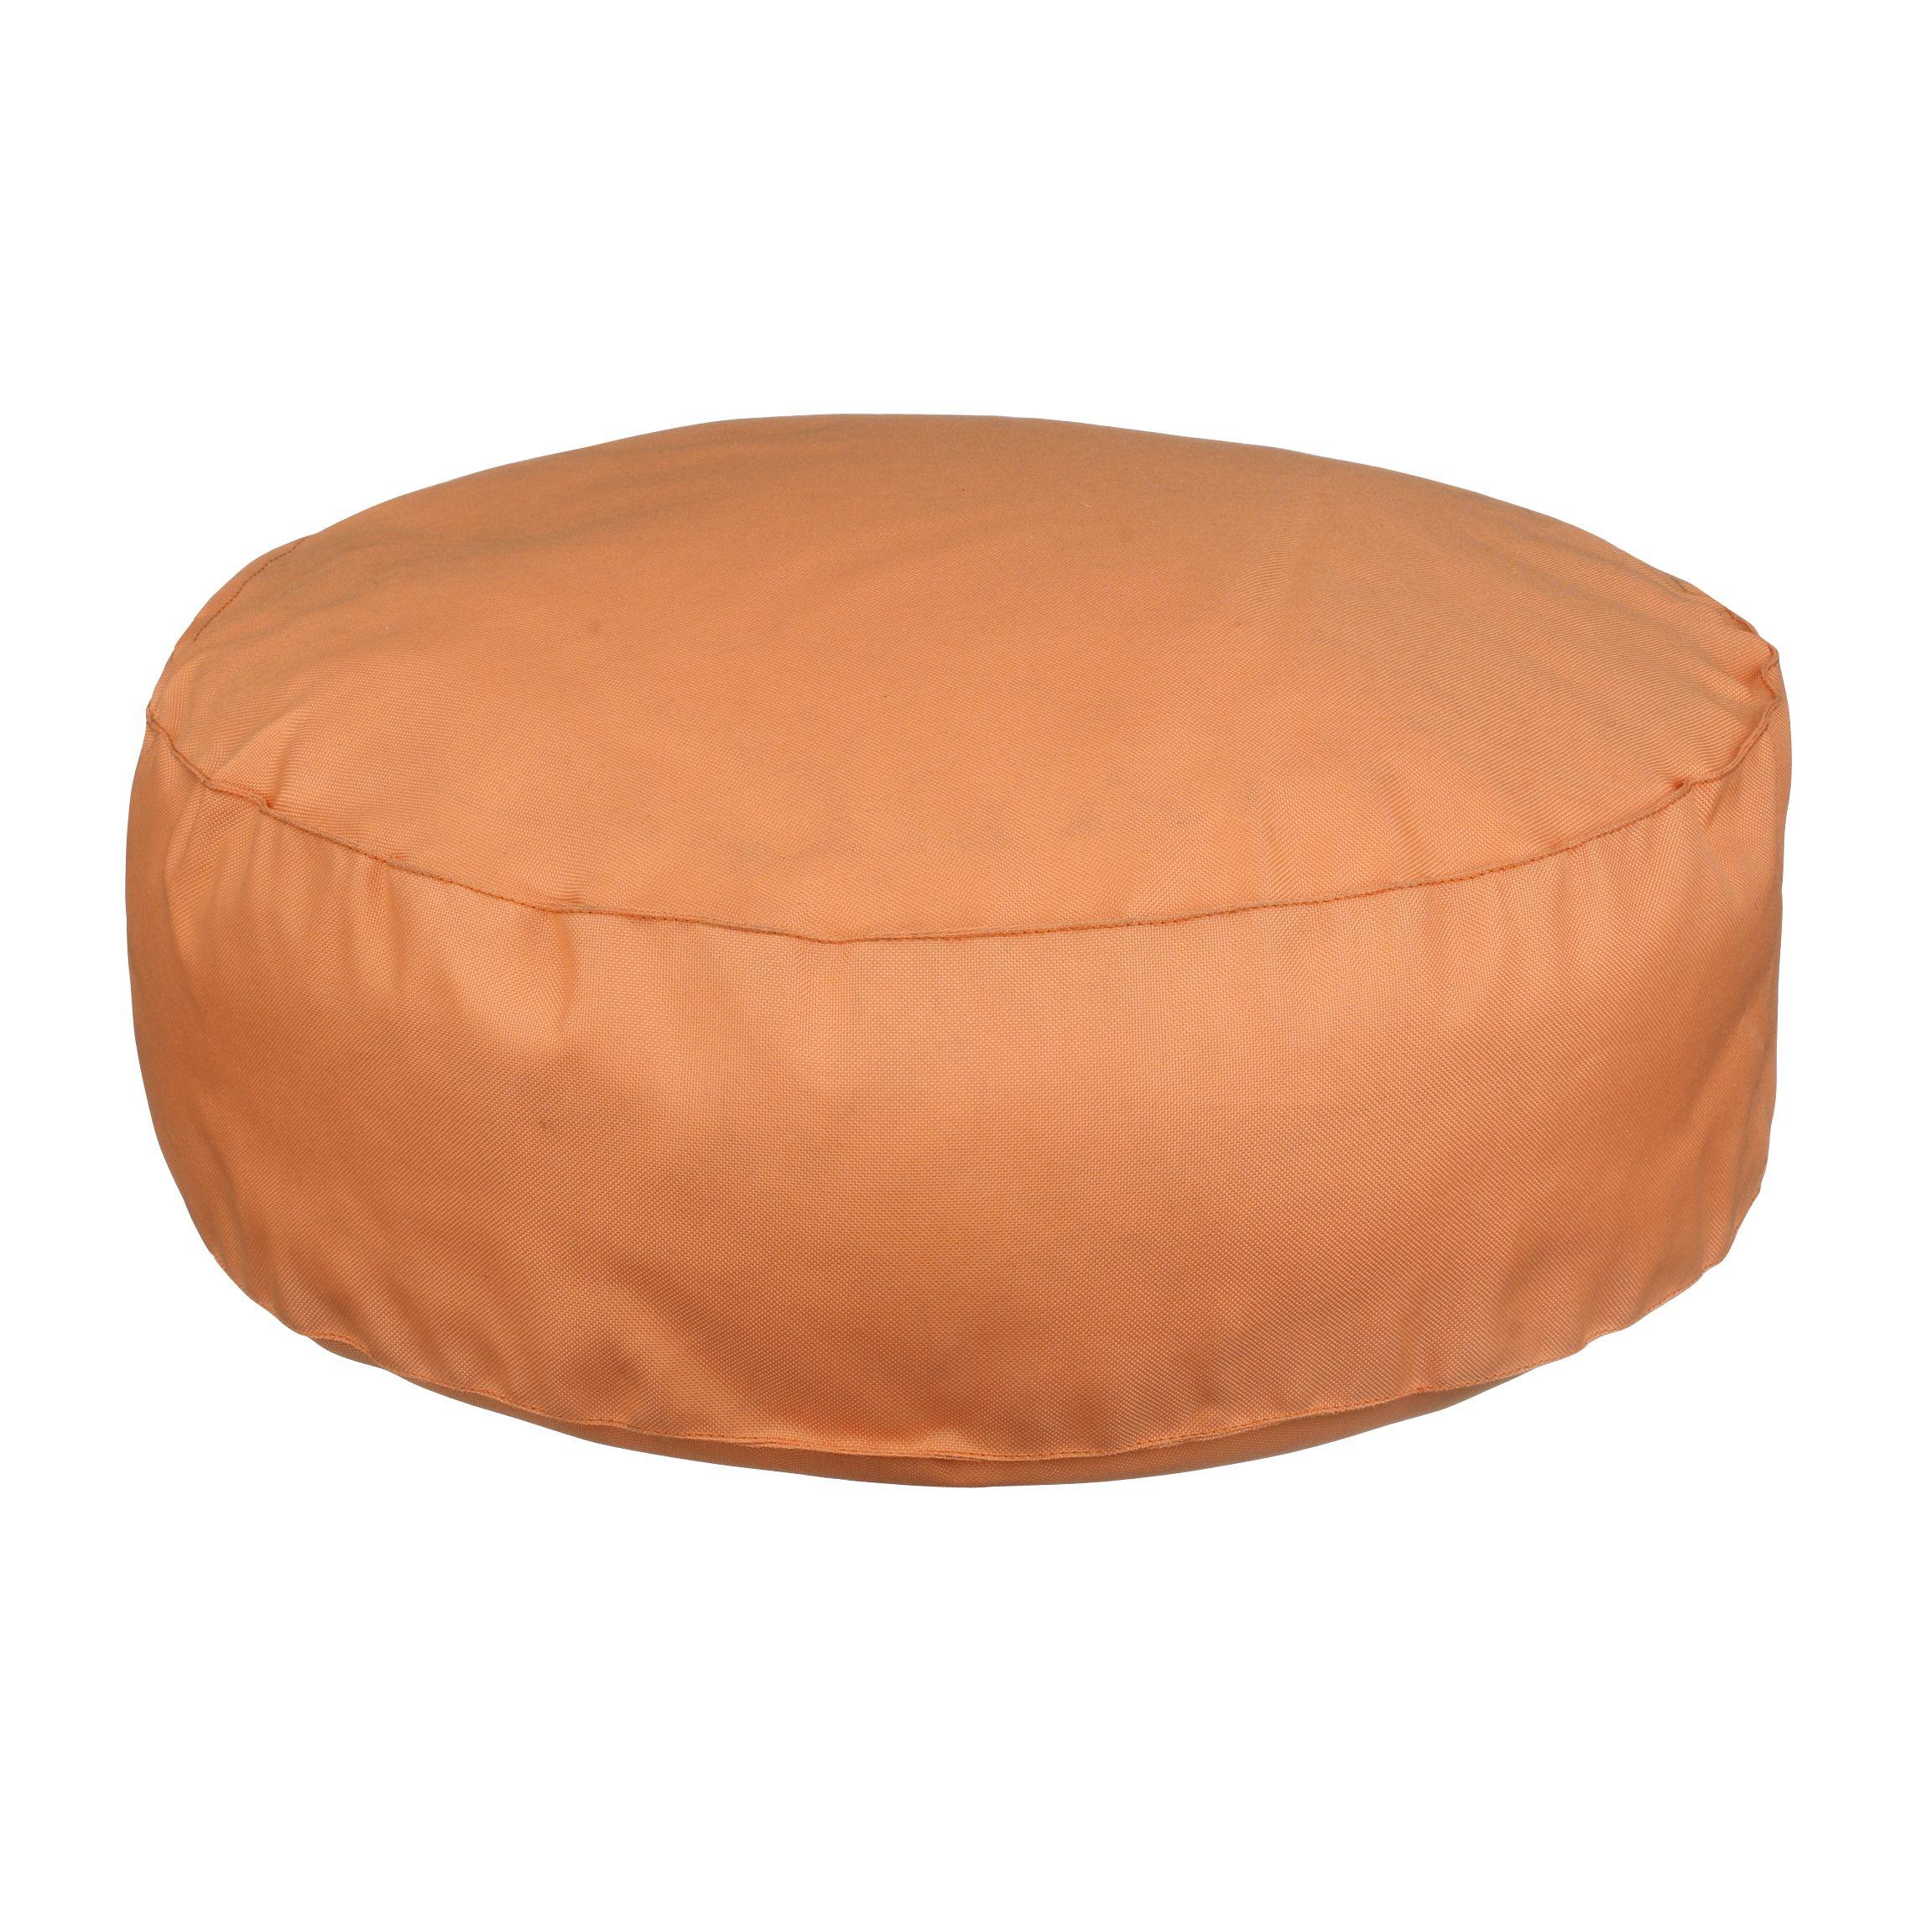 John Lewis Small Round Beanbag, Pumpkin, Dia. 50cm